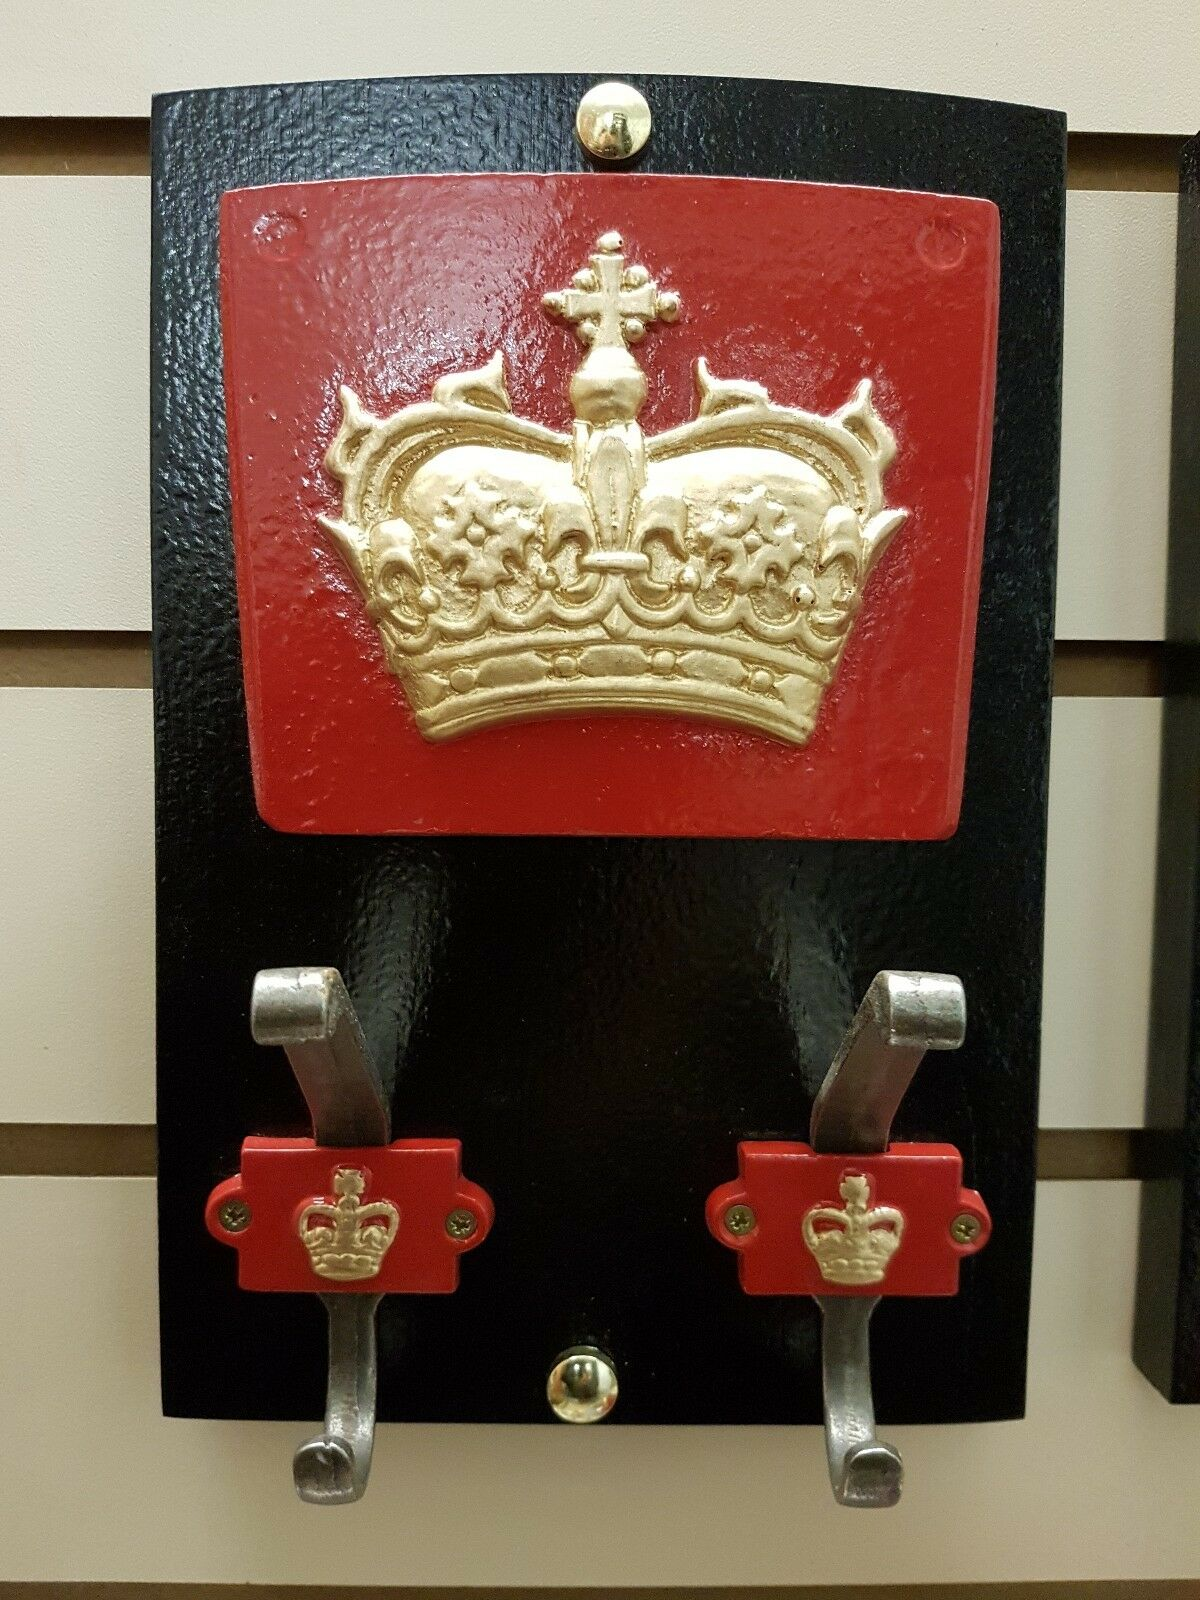 rot TELEPHONE BOX COAT HANGER USING THE CAST OF THE CROWN OF SCOTLAND K6, KIOSK